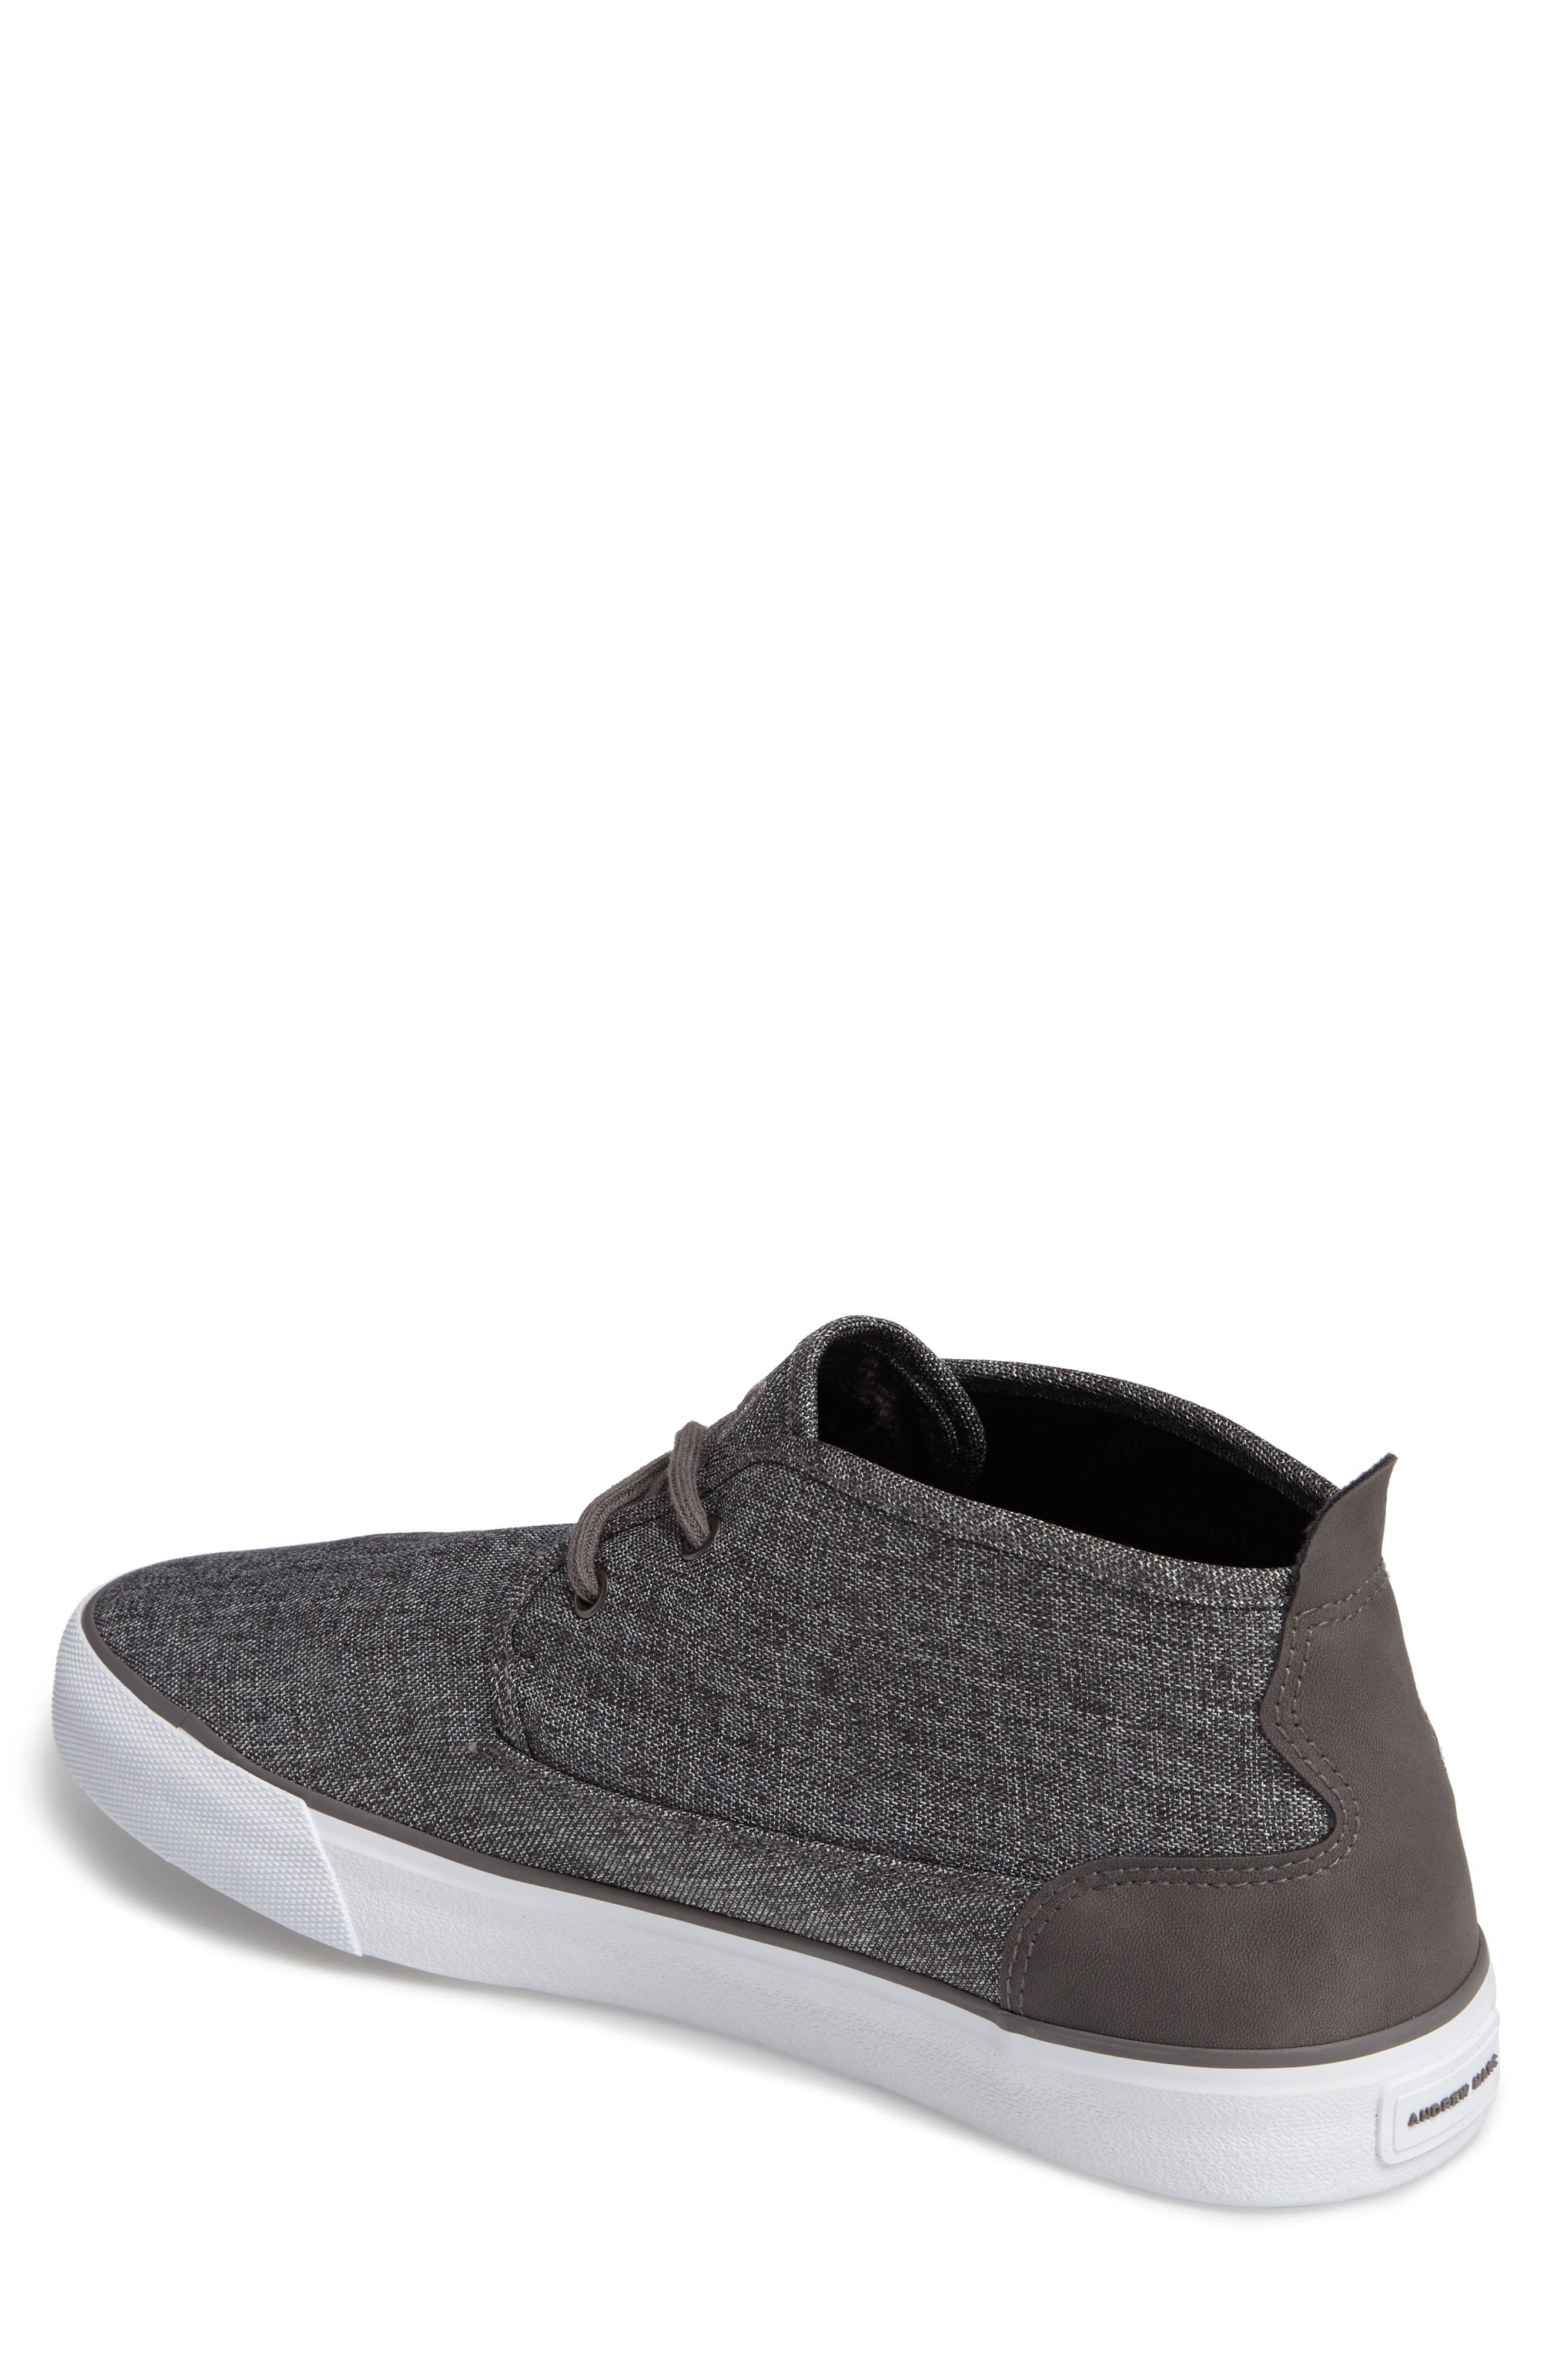 Reade Chukka Sneaker,                             Alternate thumbnail 2, color,                             Charcoal/Dk Charcoal/White